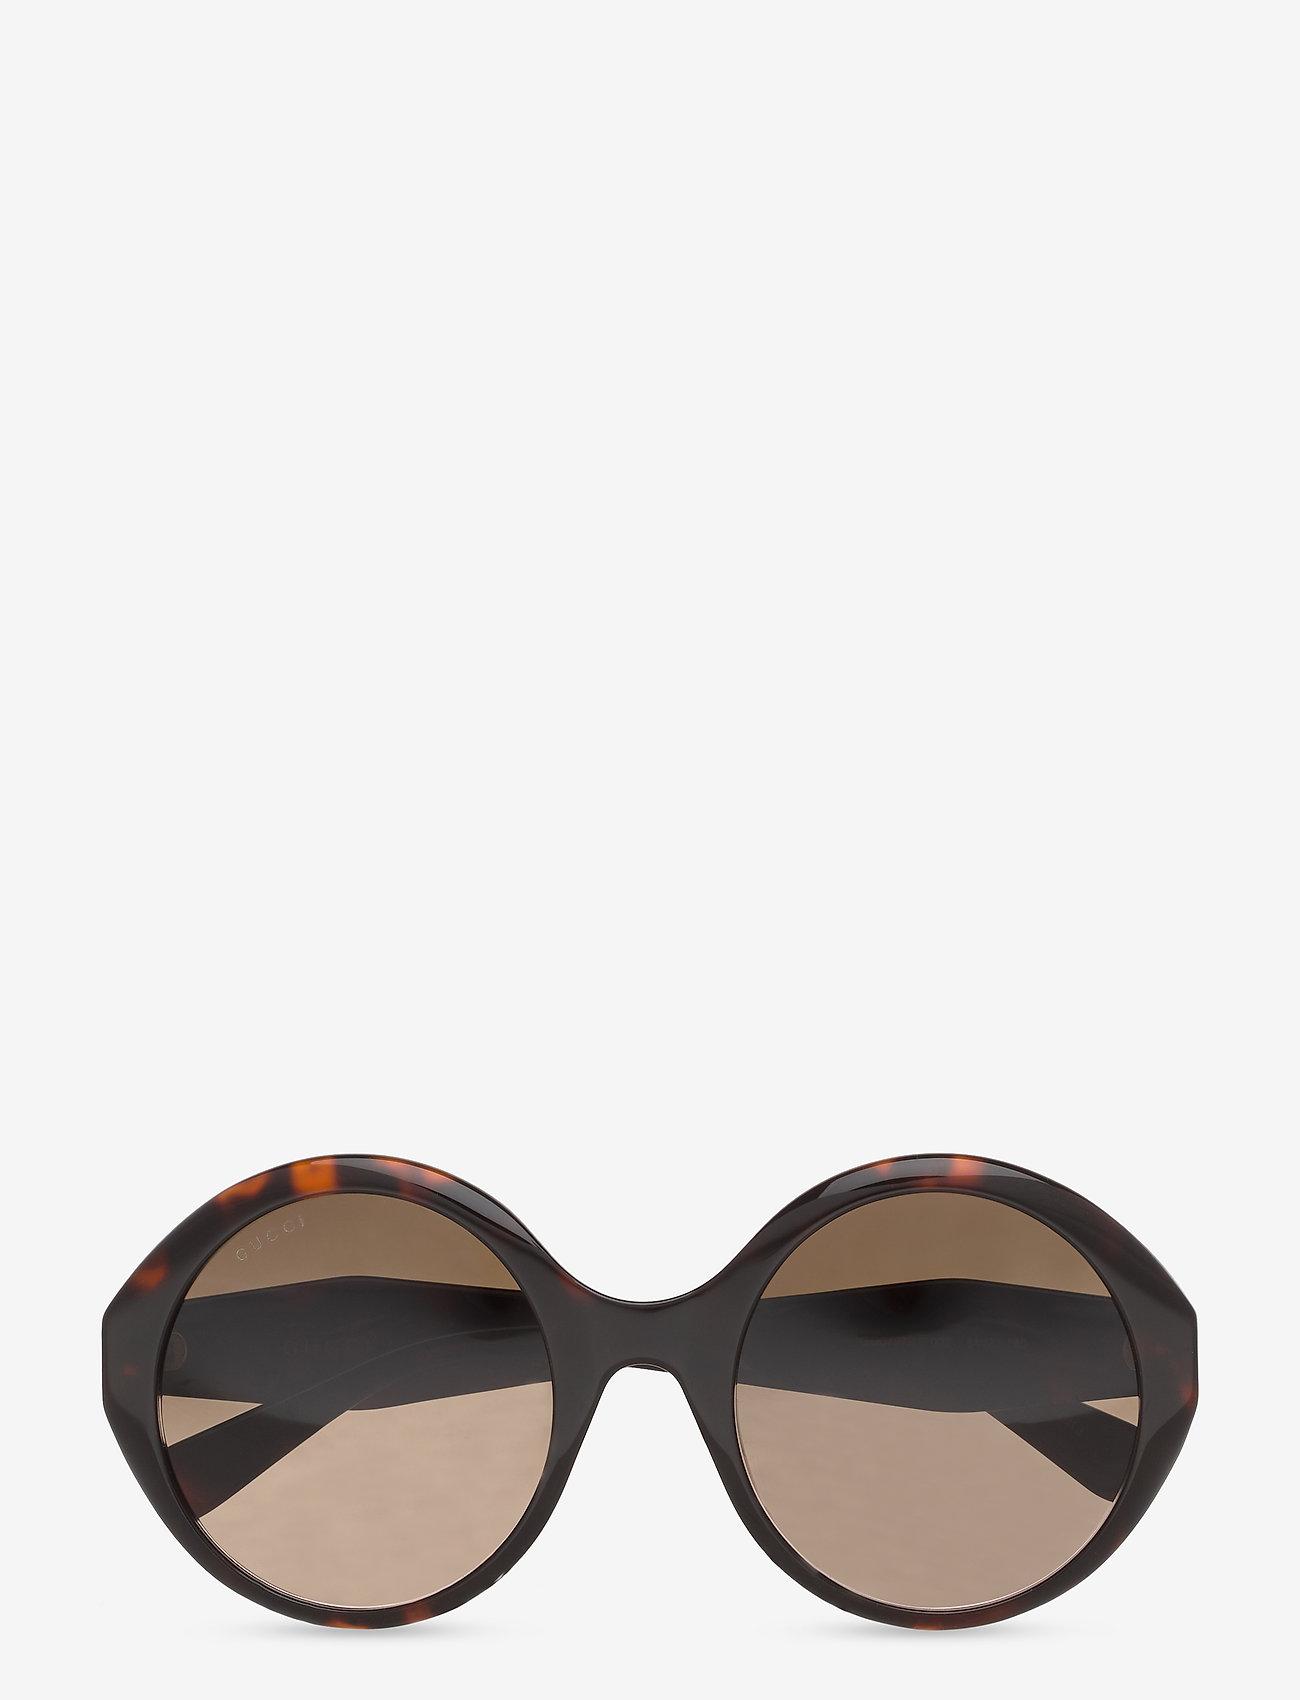 Gucci Sunglasses - GG0797S - rond model - havana-havana-brown - 0